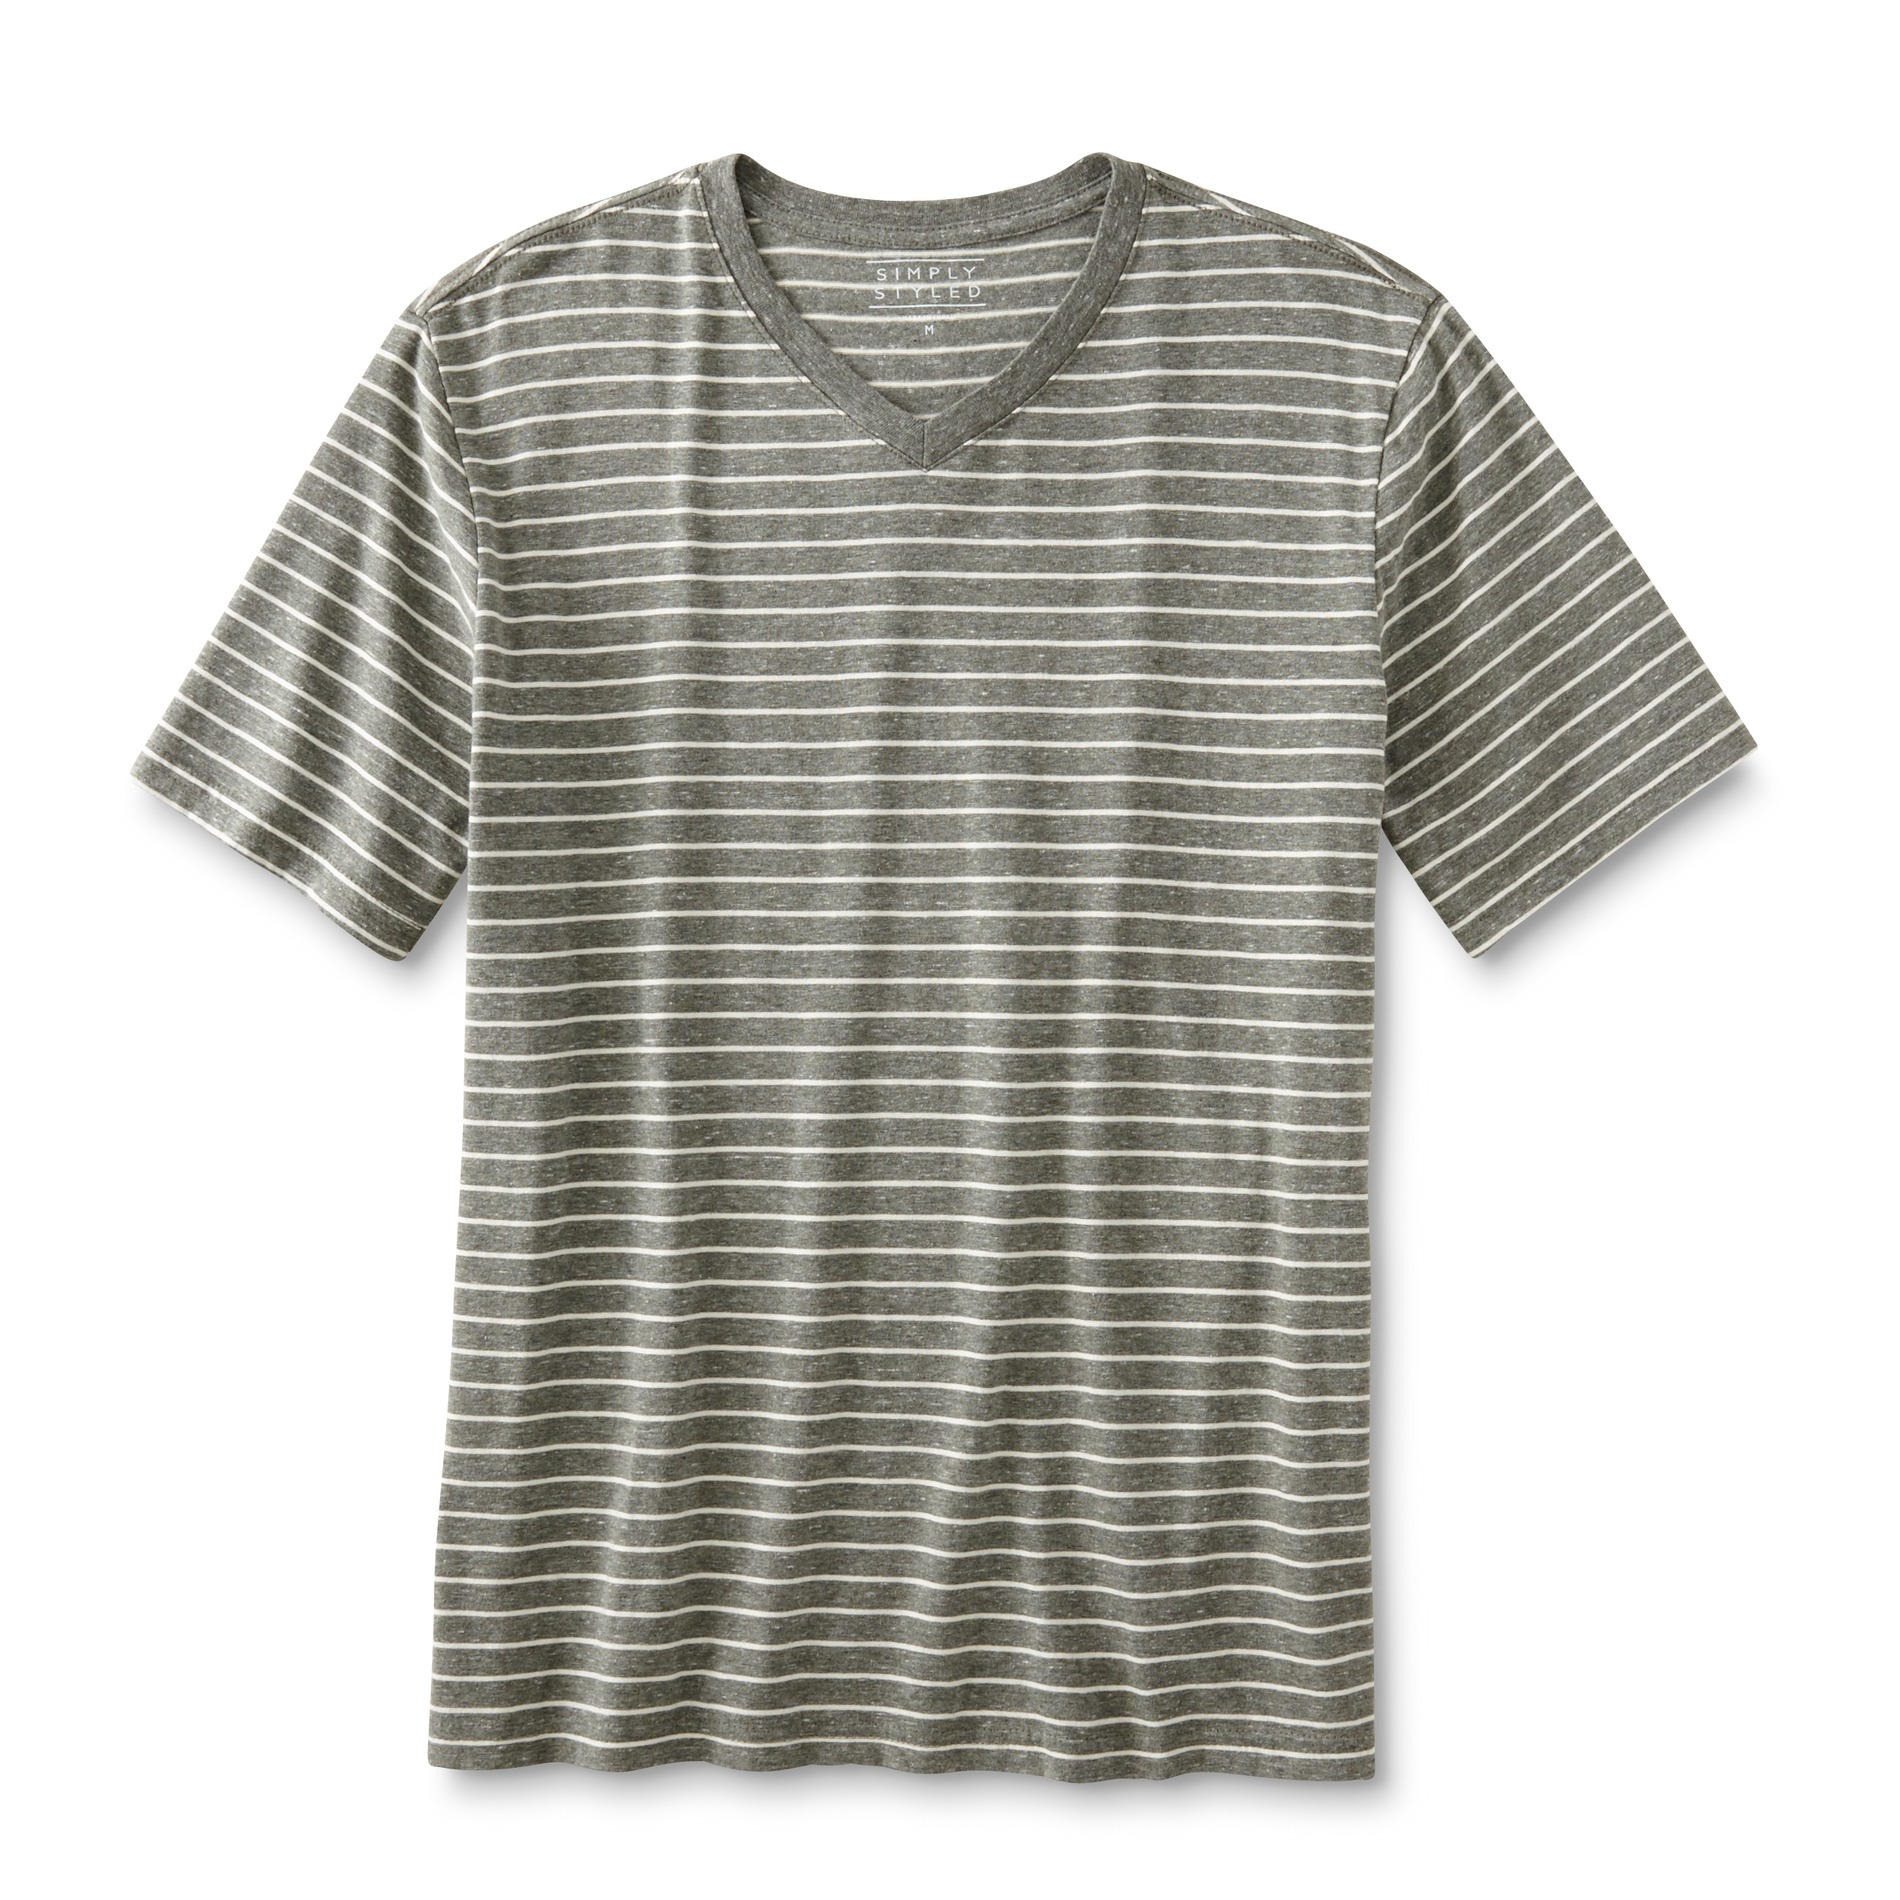 Simply styled men 39 s big tall v neck t shirt striped for Mens tall v neck t shirts